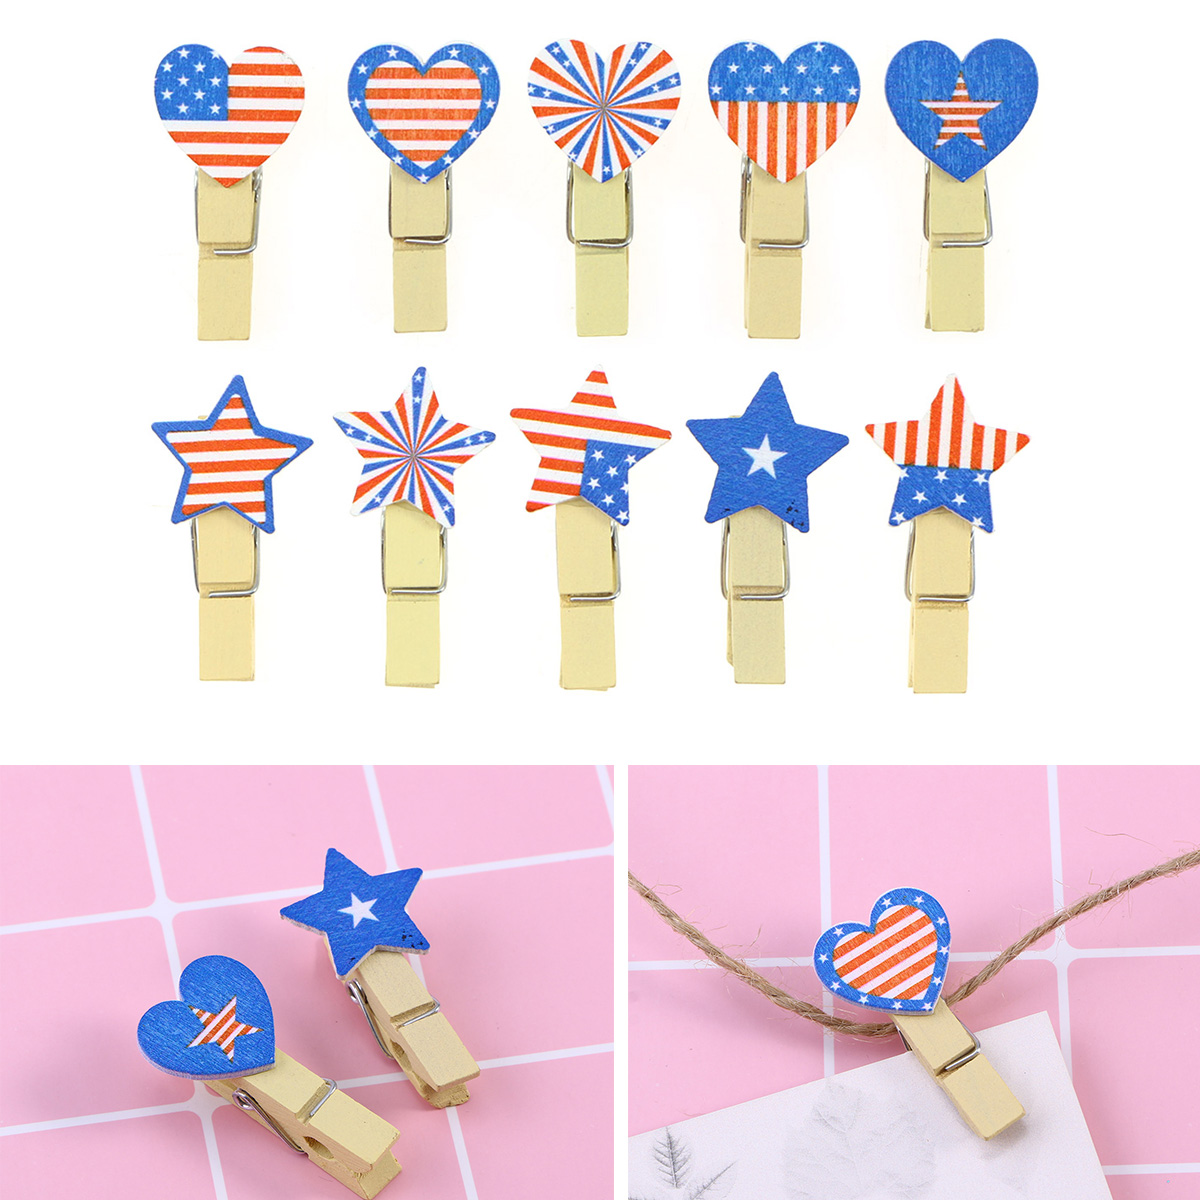 10pcs American Flag Patriotic Photo Clip Card Memo Note Message Craft Decoration